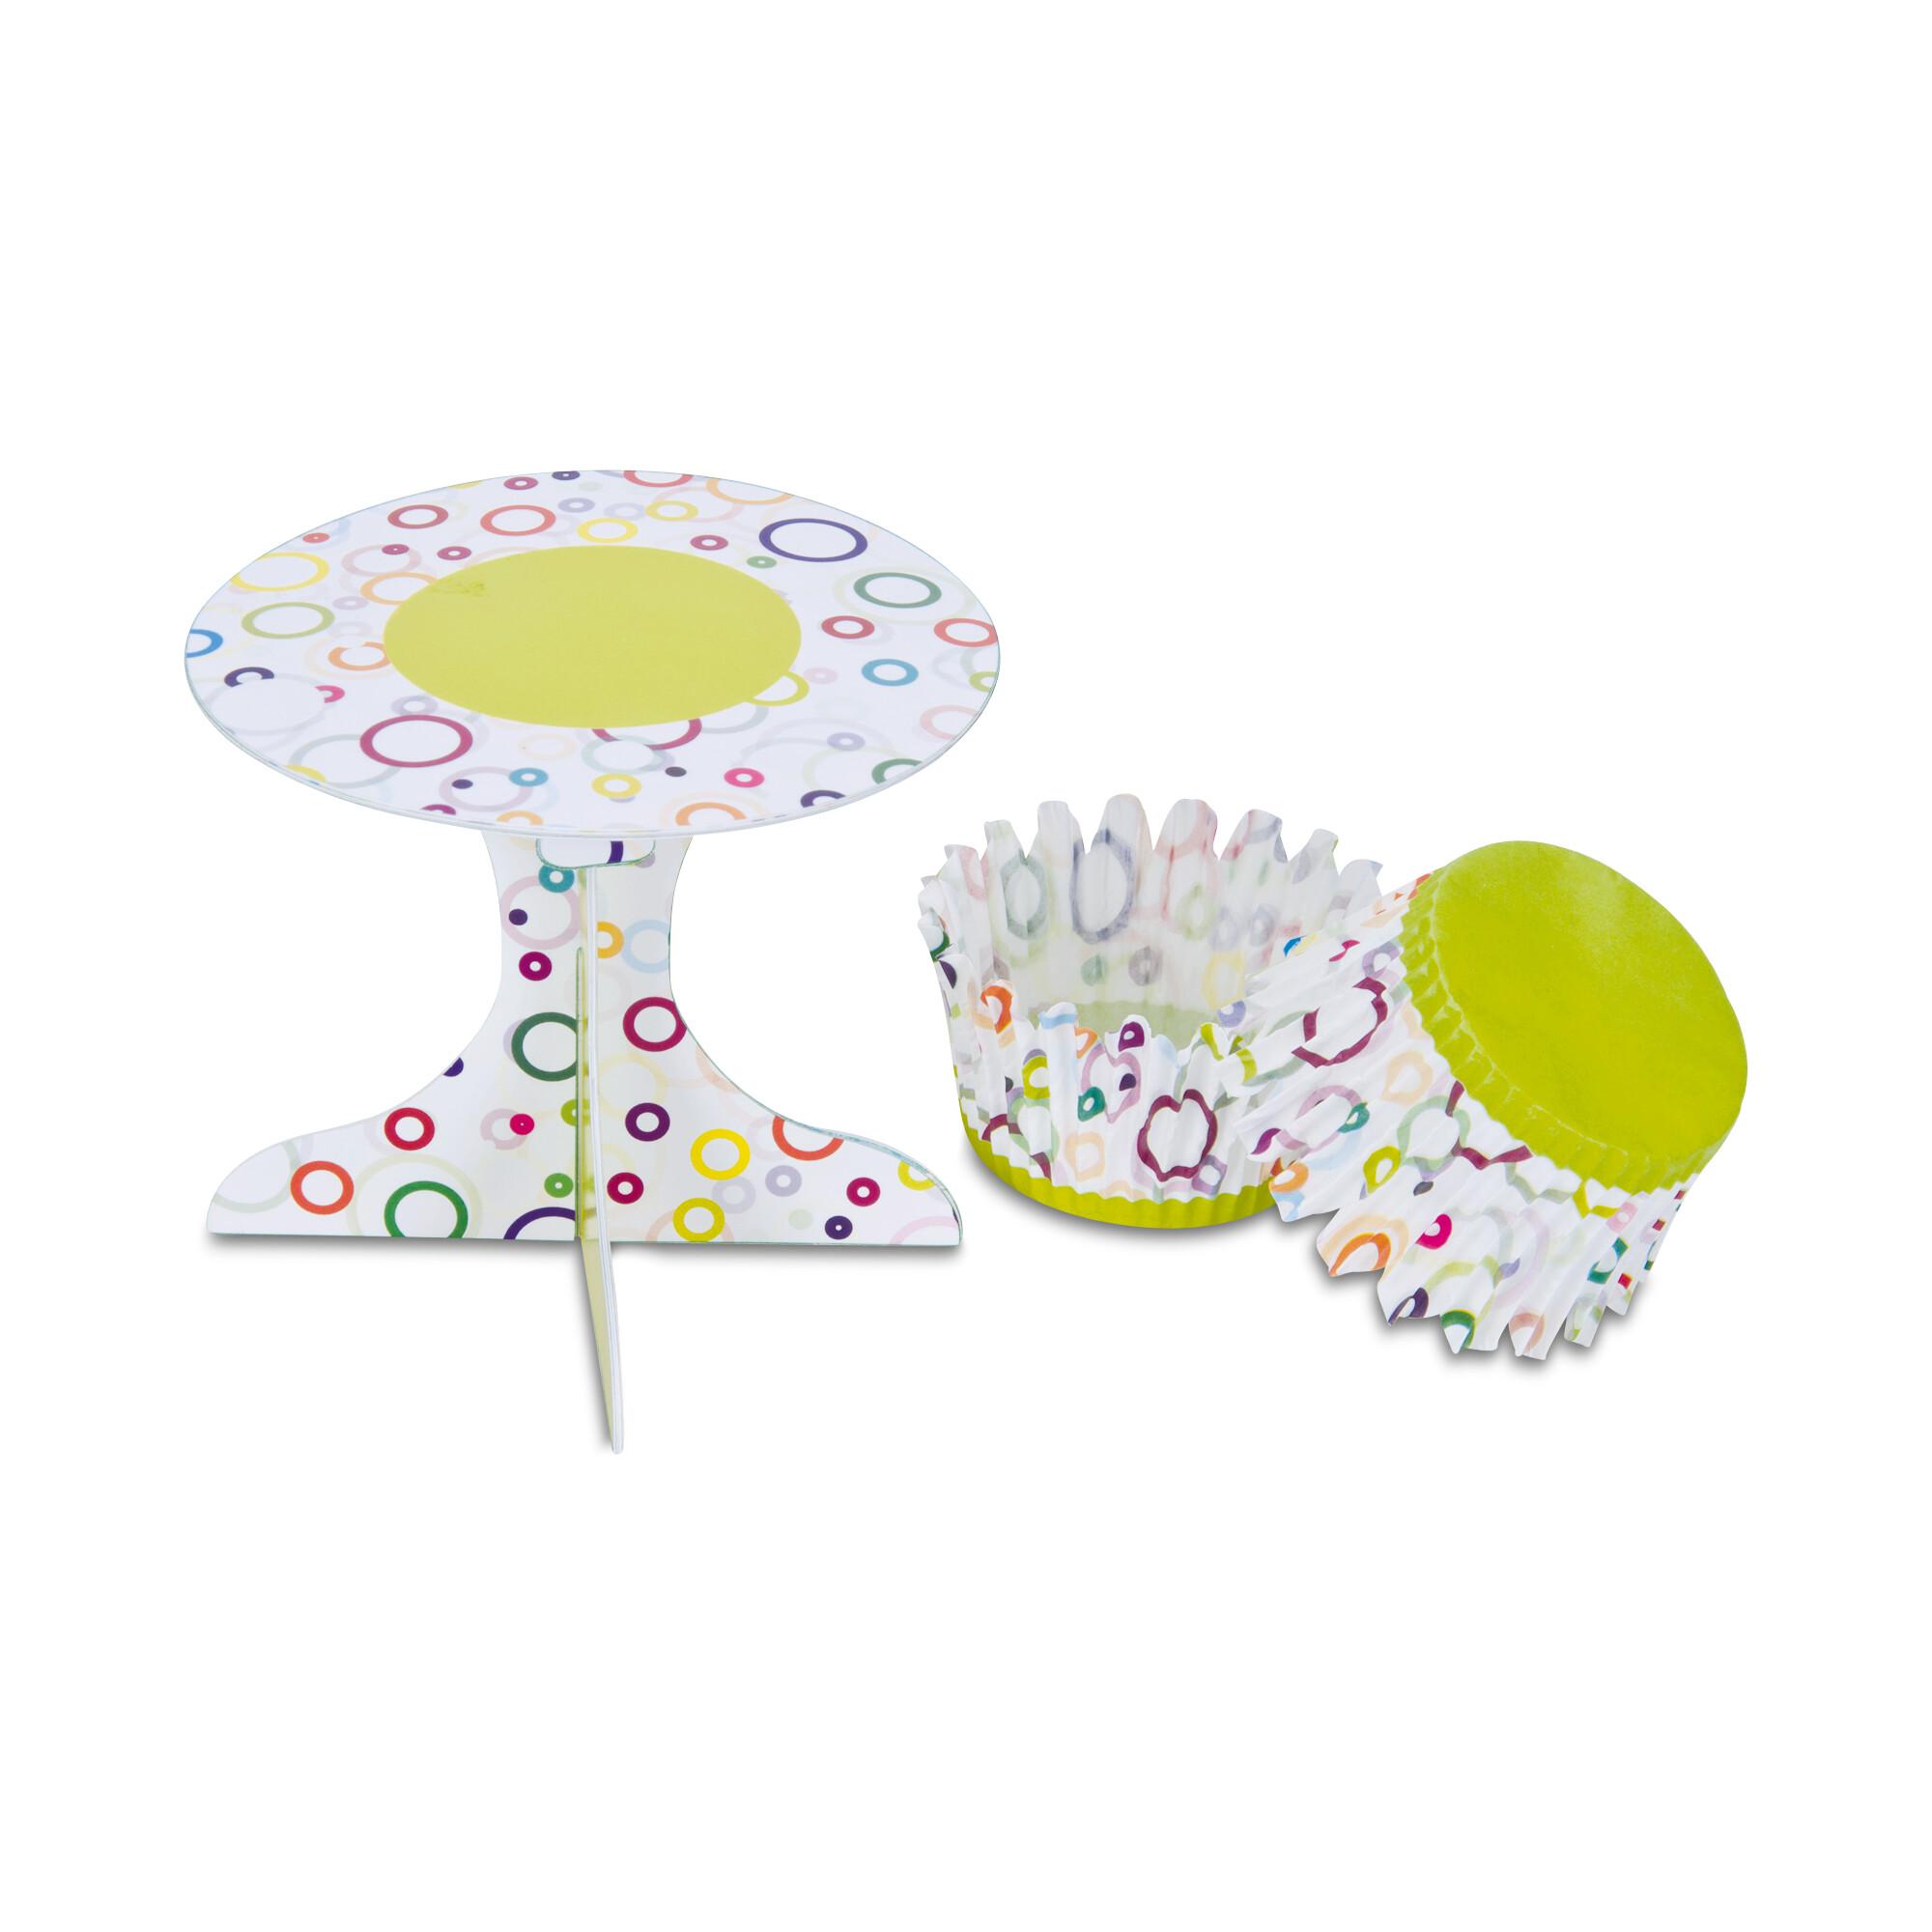 Cupcake deko - Party - Set, 36 parts